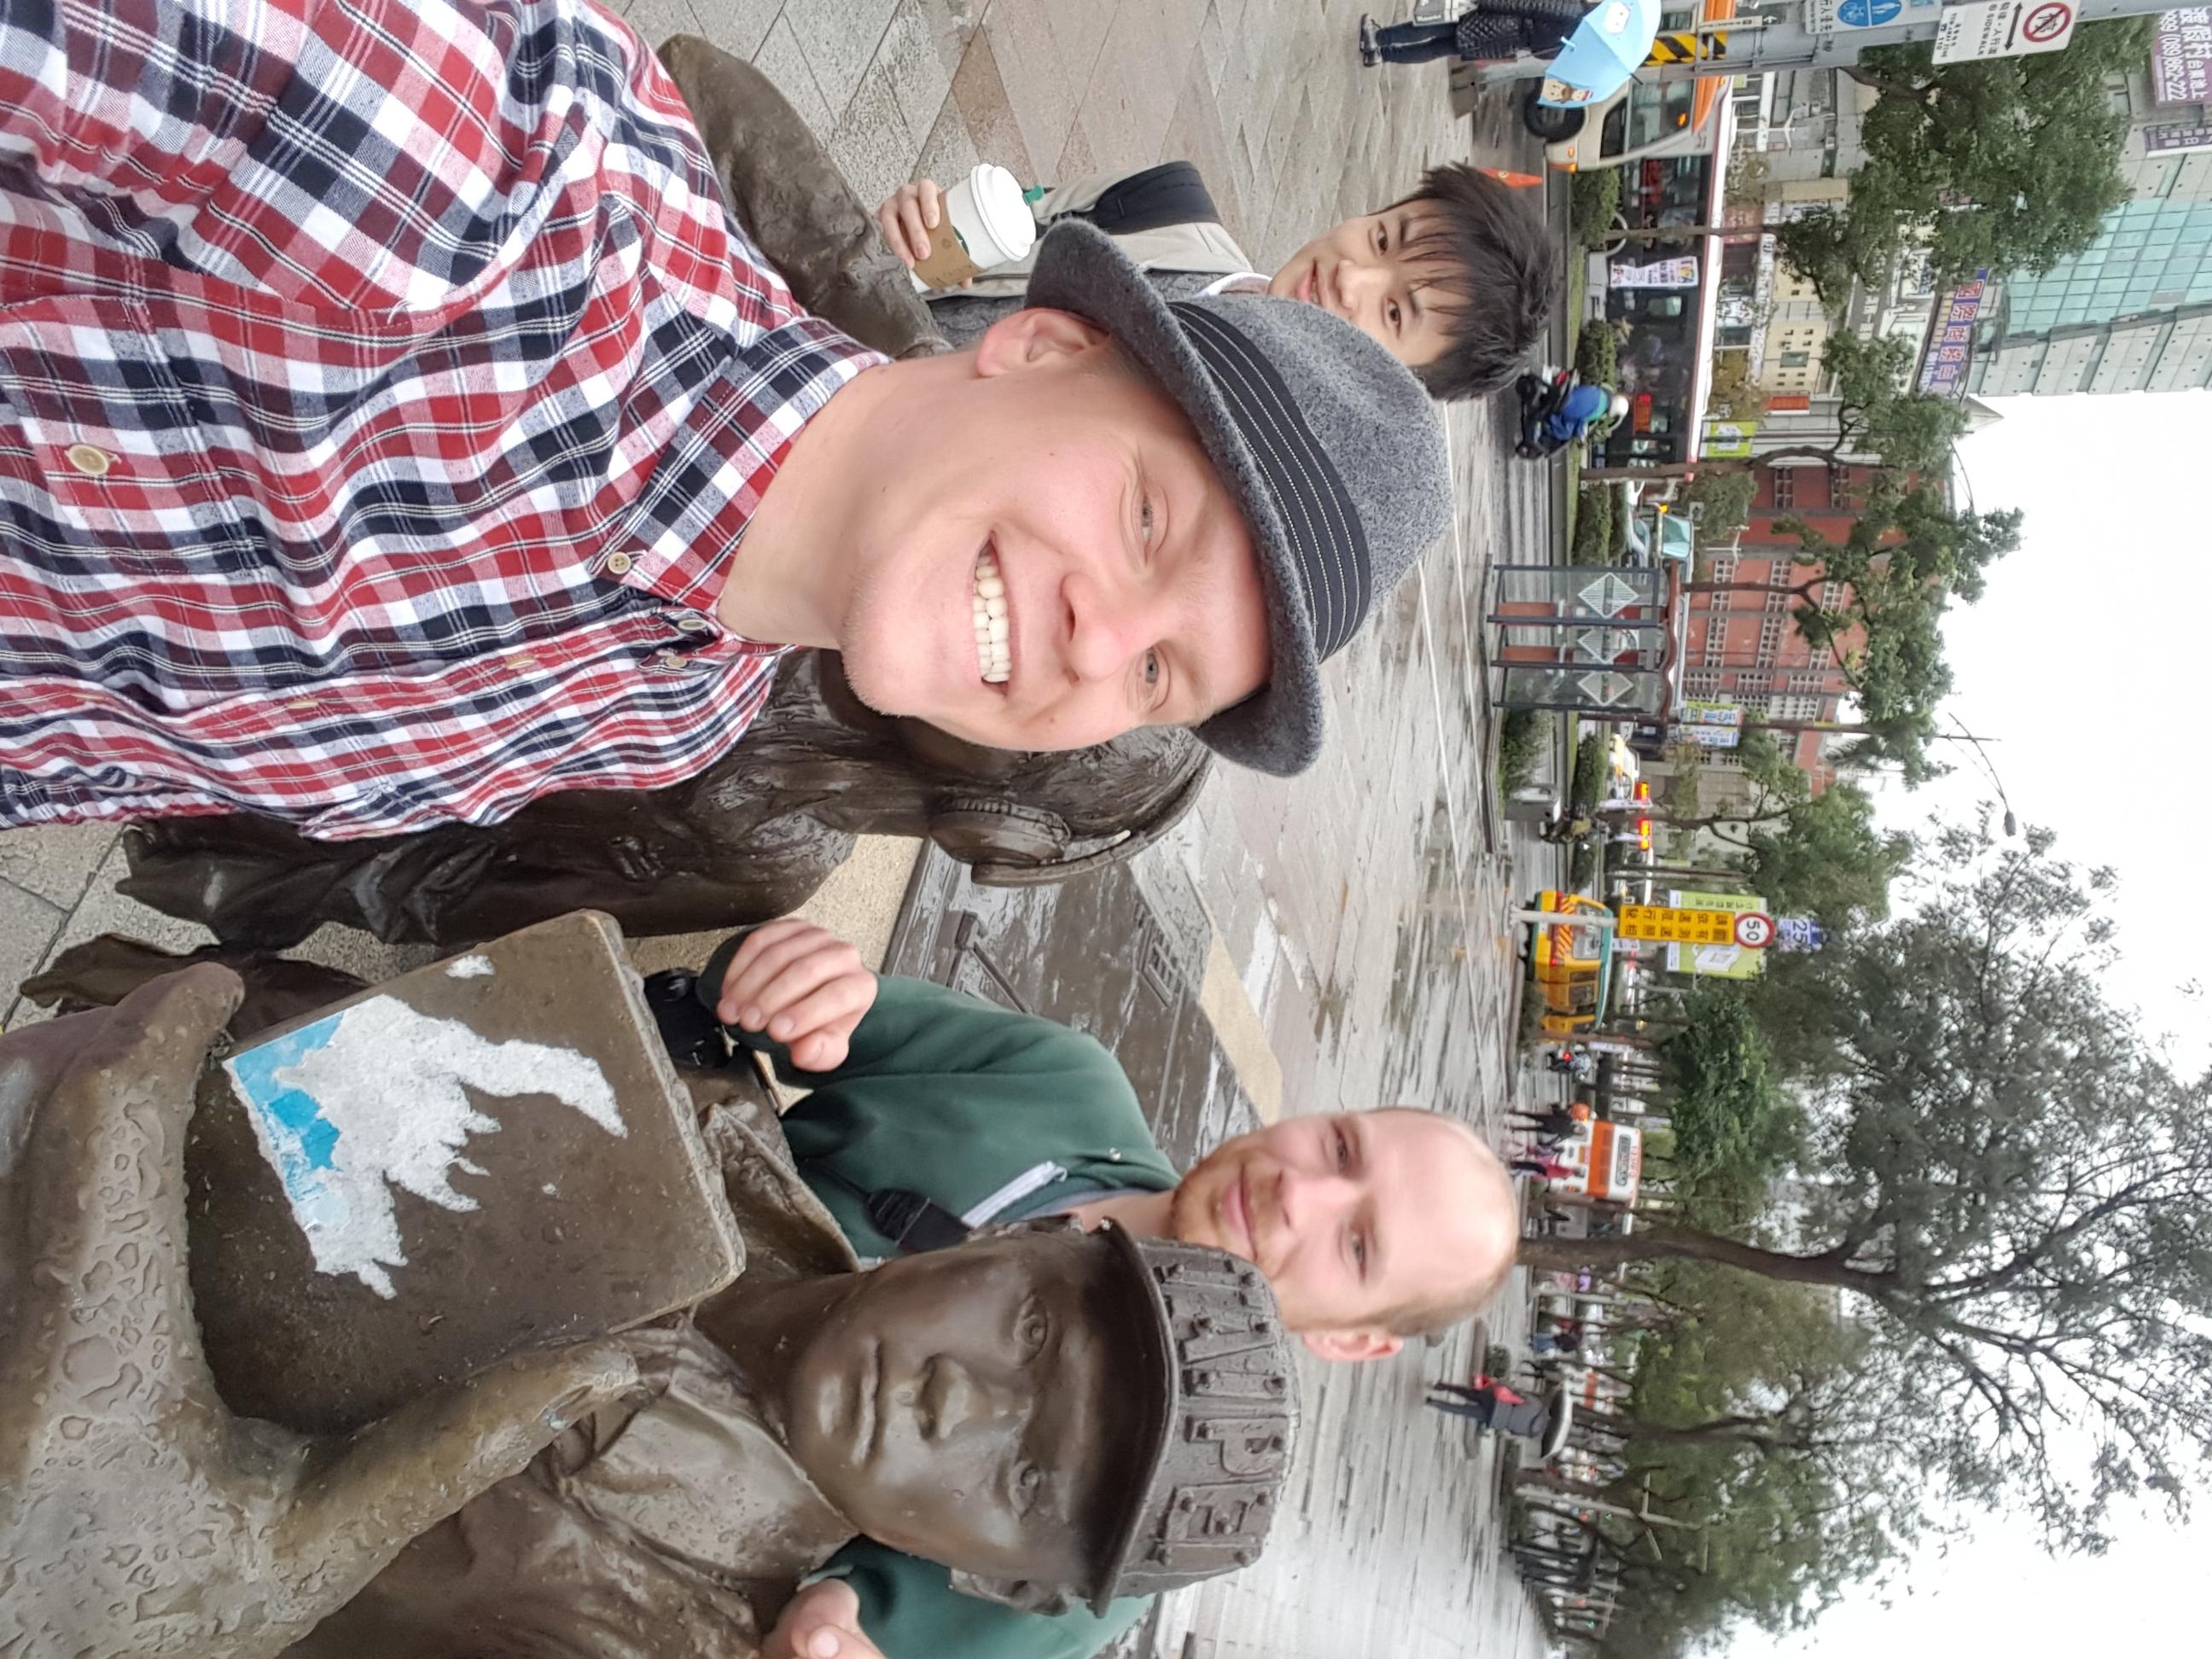 Nem vicc, Selfi szobor!